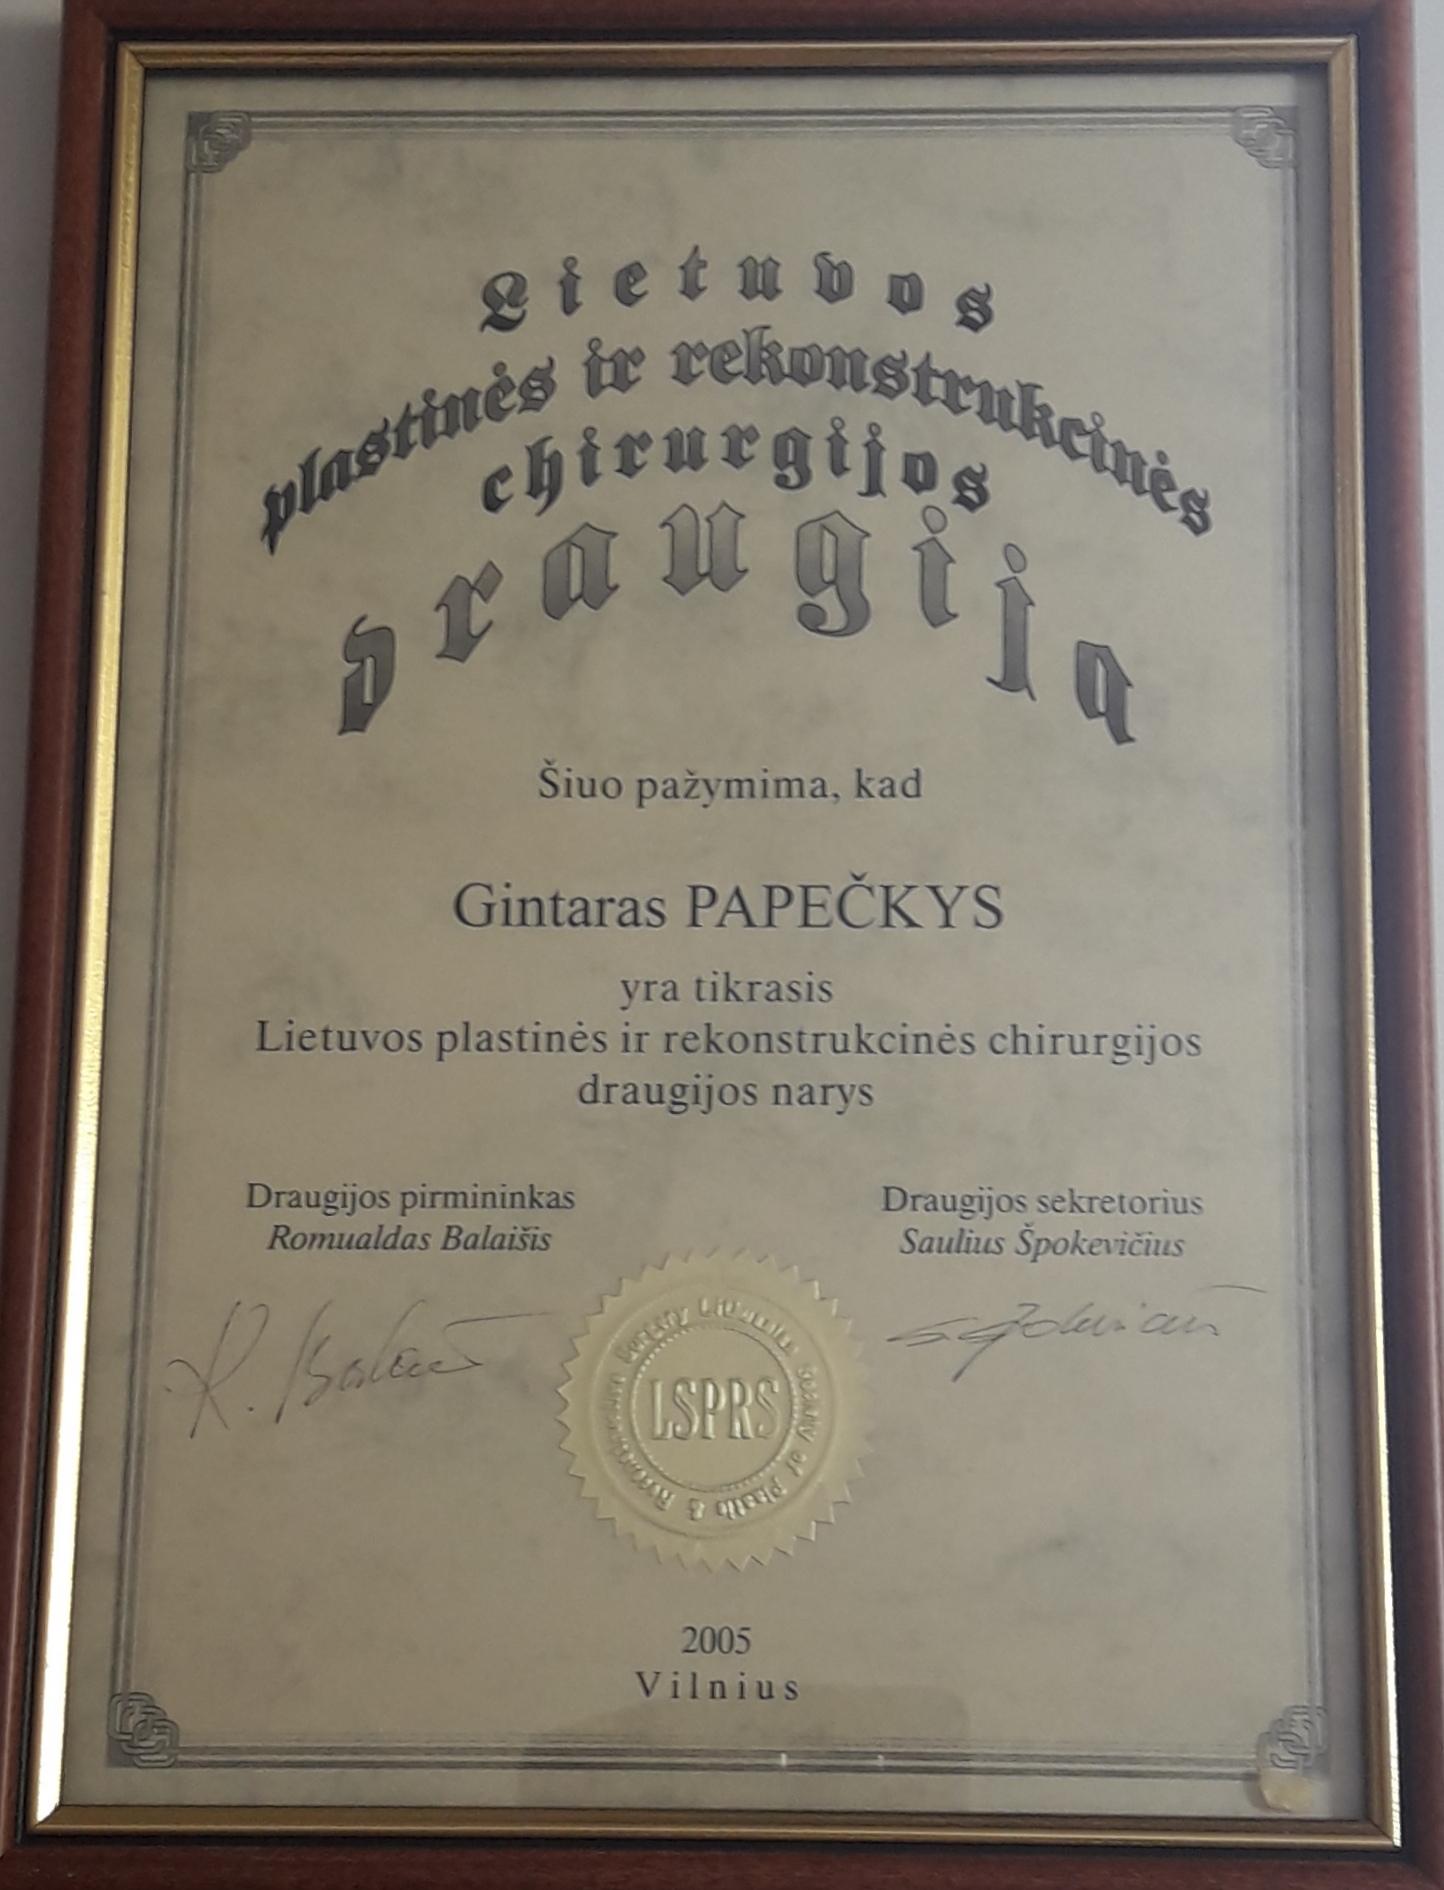 Gintaras Papeckys